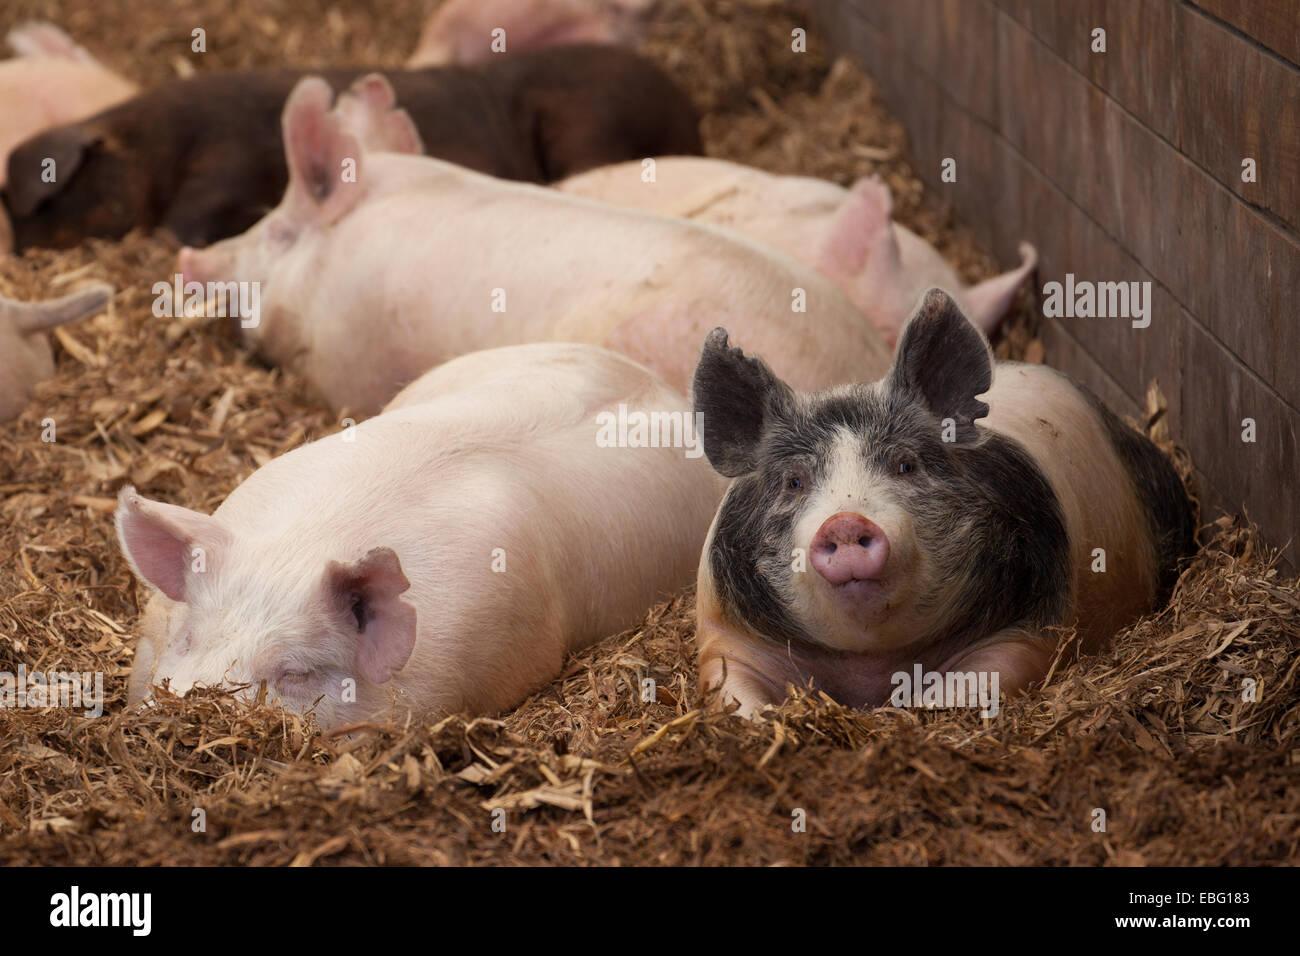 Finisher hogs inside barn. ISU Swine Farm. Ames, Iowa. - Stock Image